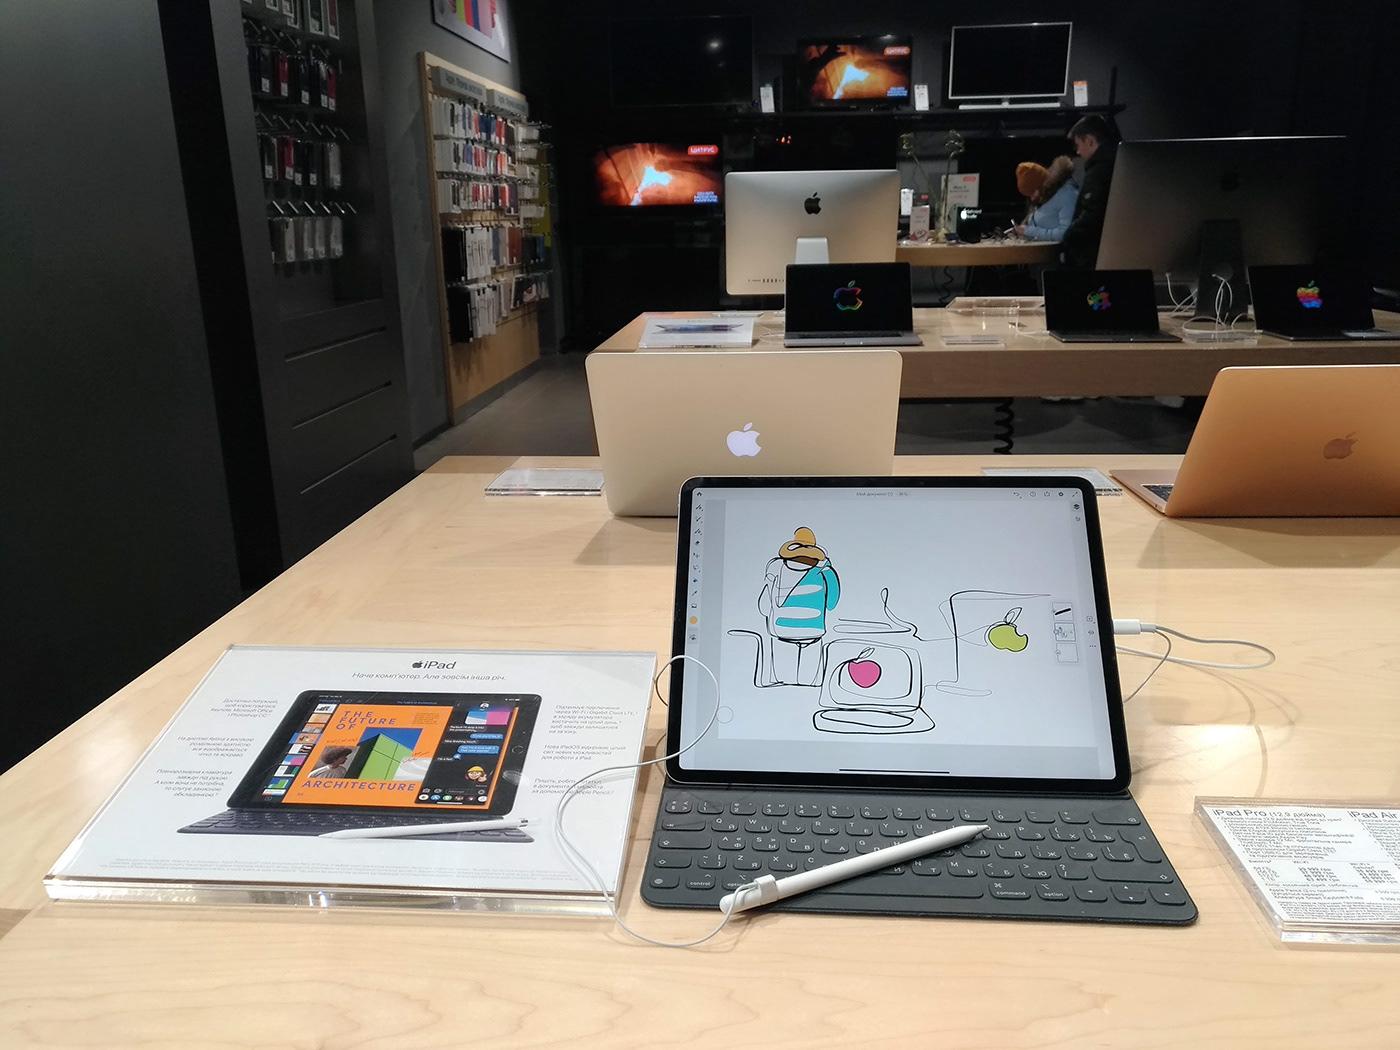 Image may contain: indoor, computer keyboard and computer monitor